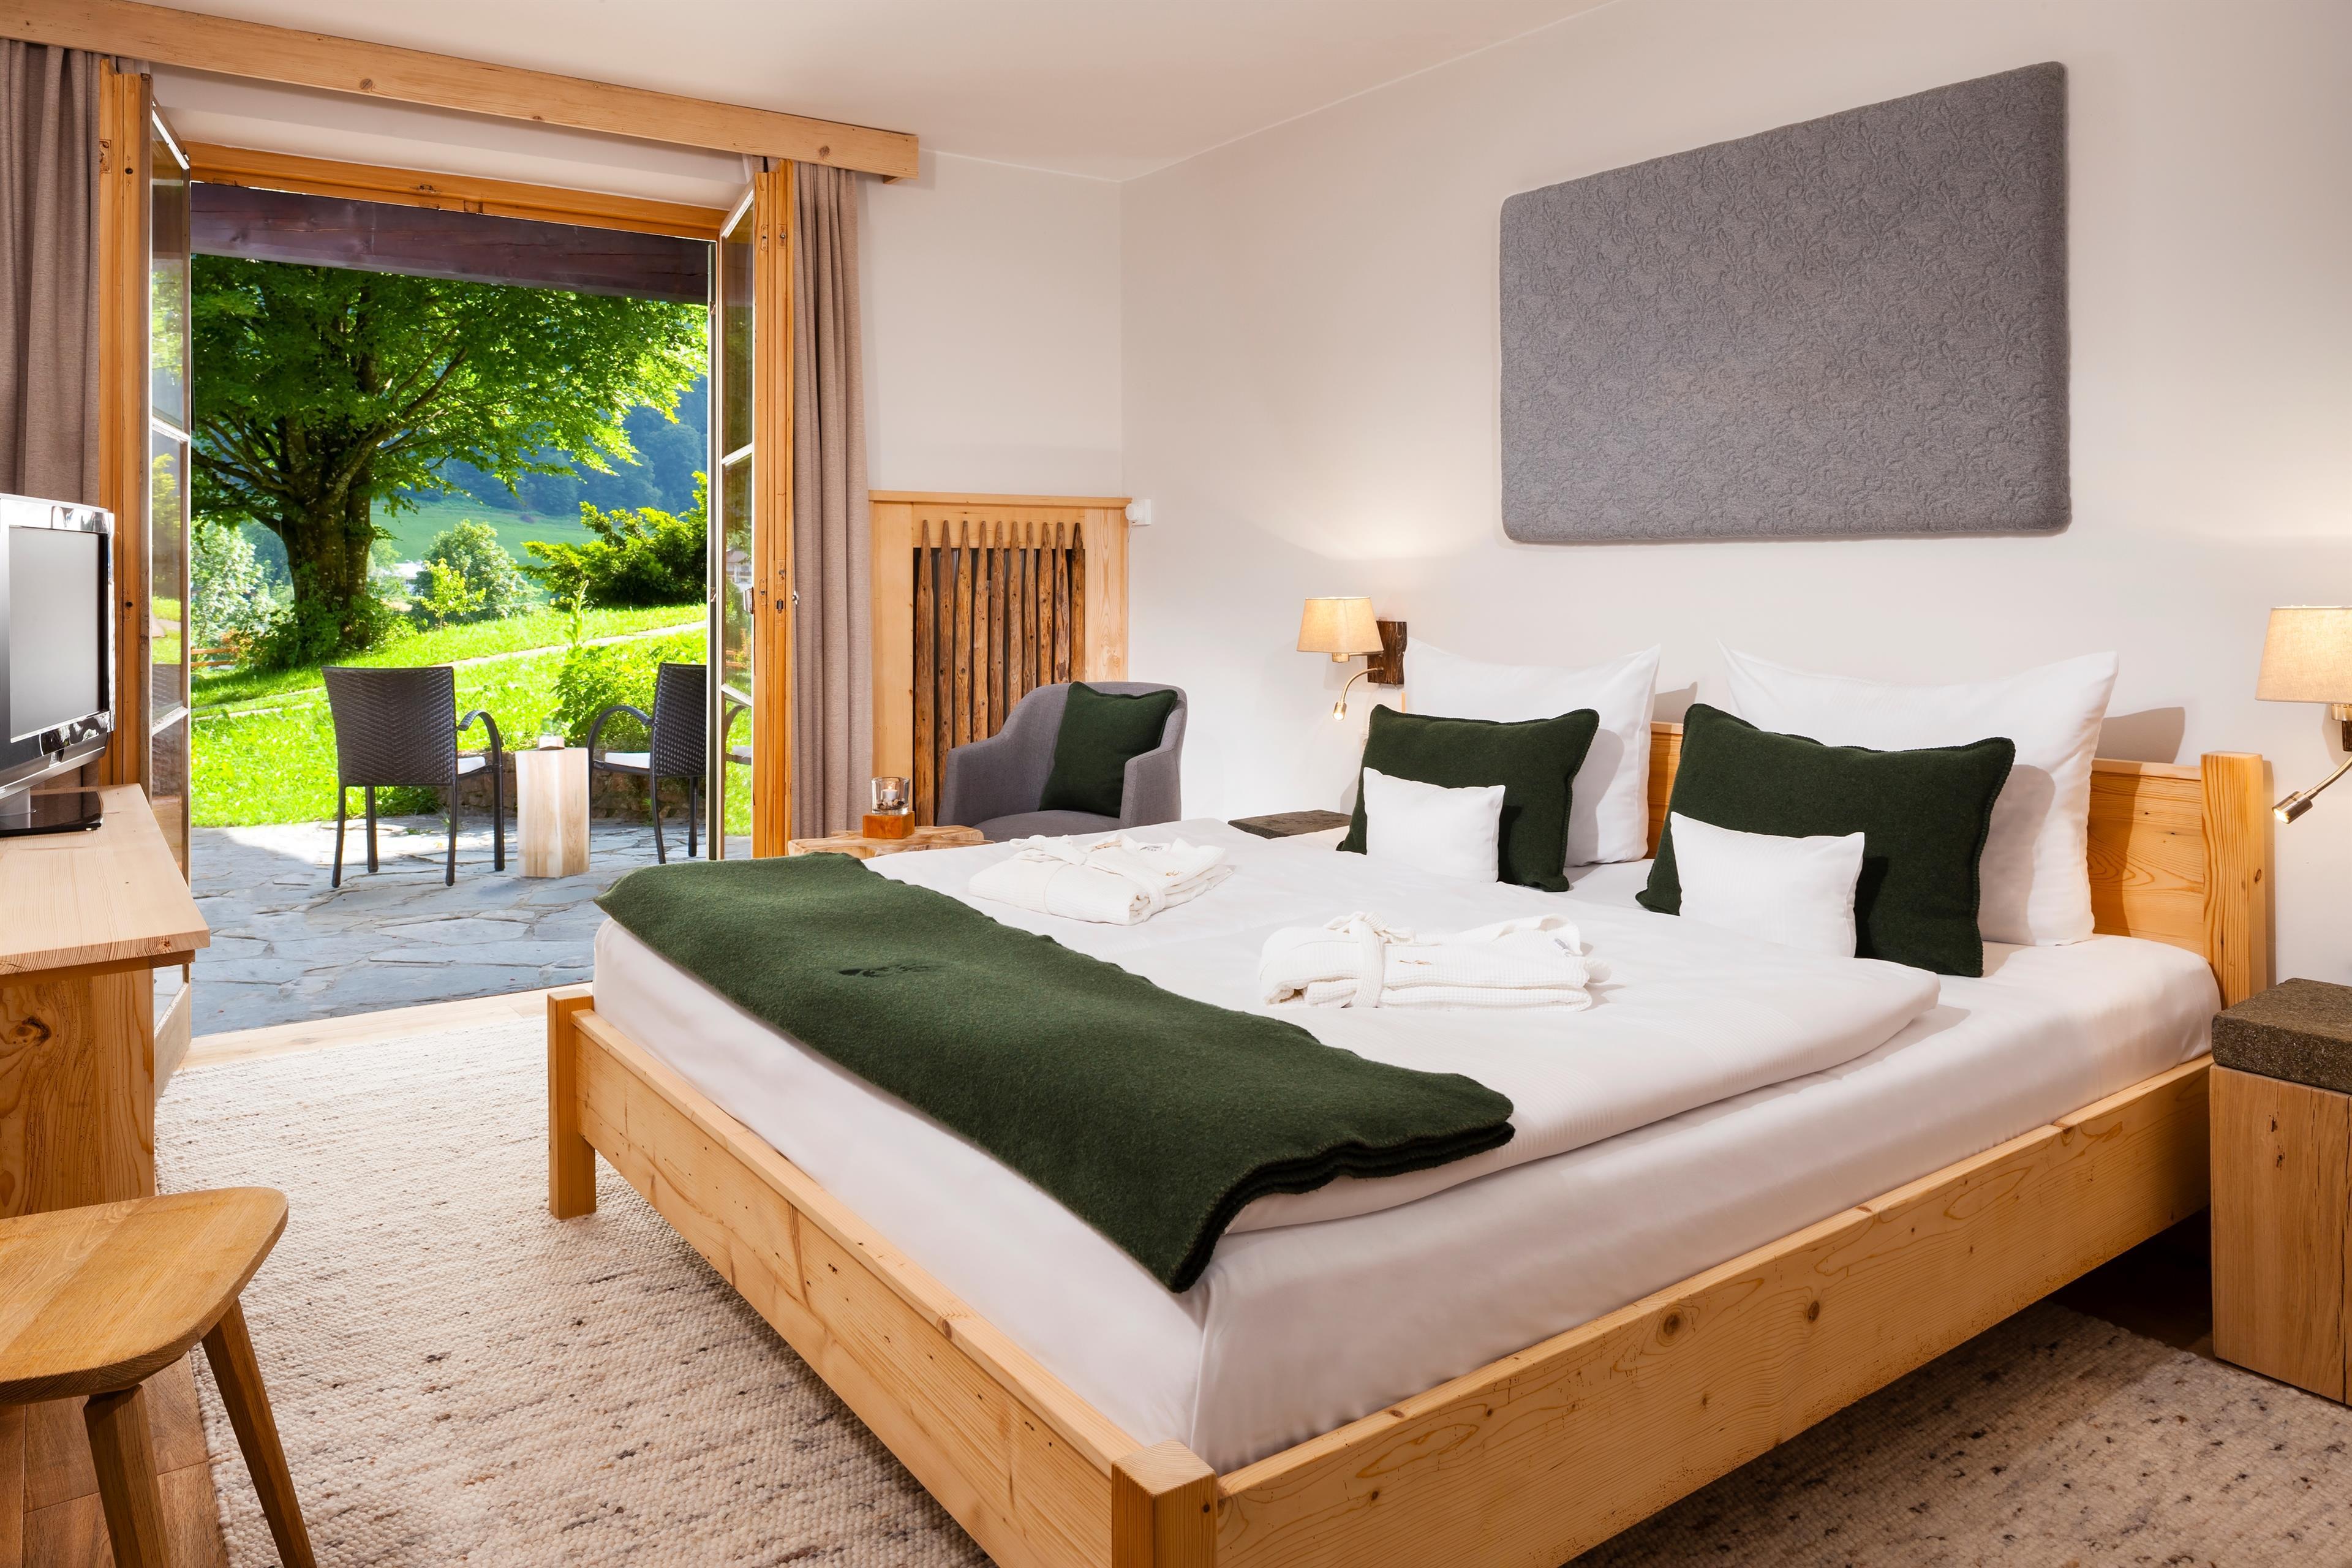 Best western plus berghotel rehlegg hotels hotels for Berghotel design